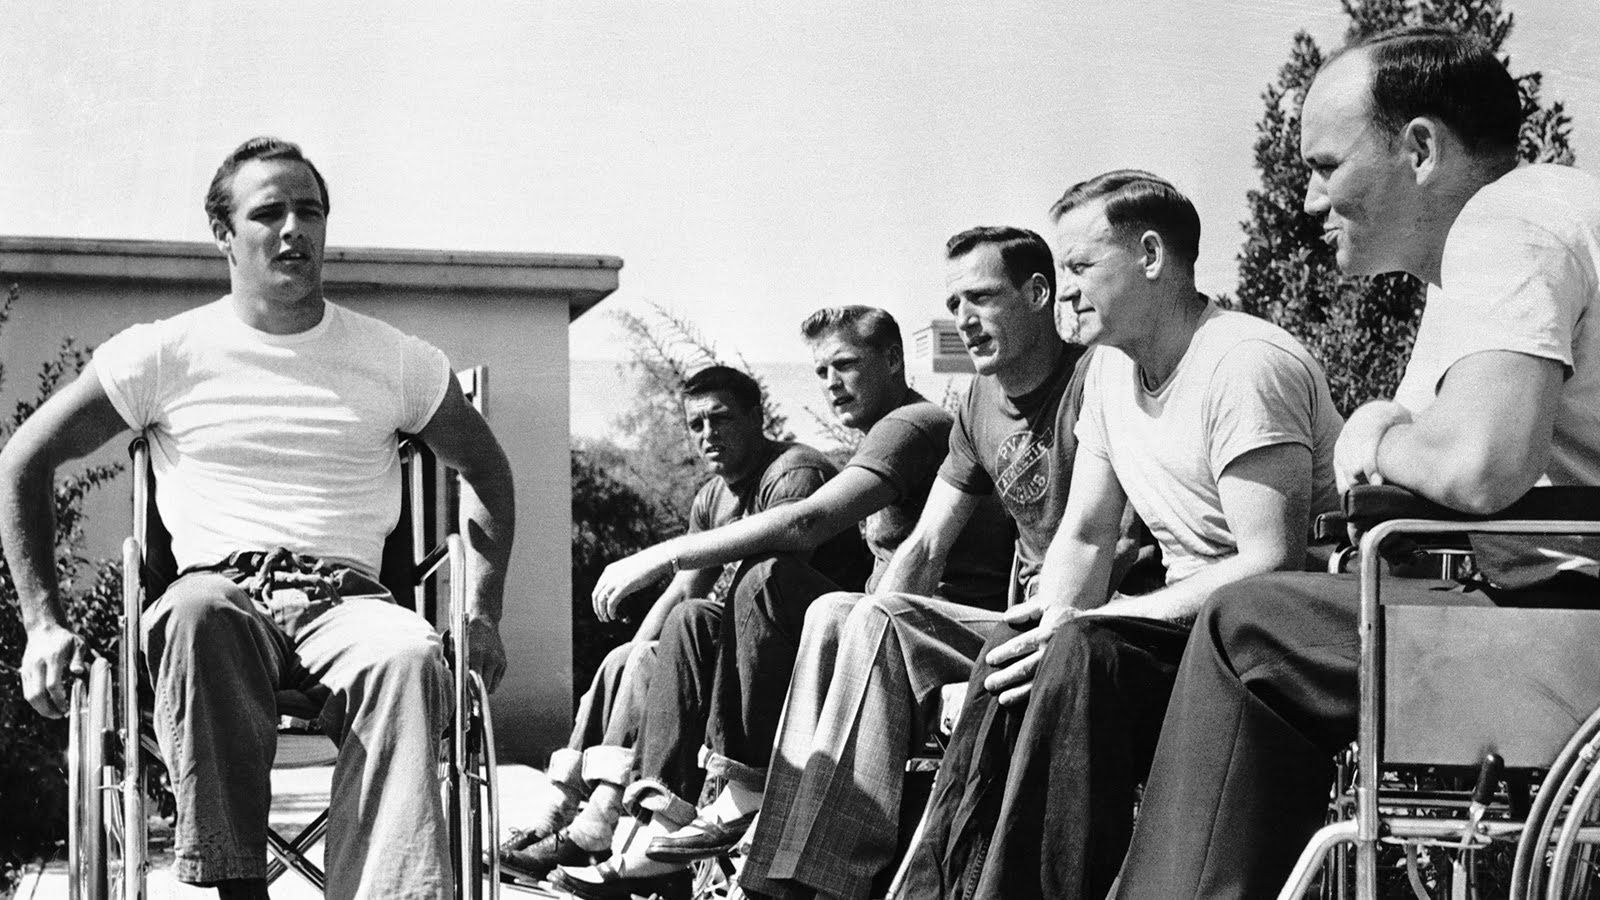 Vivirás tu vida película completa (1950) (Subtitulada en Español)